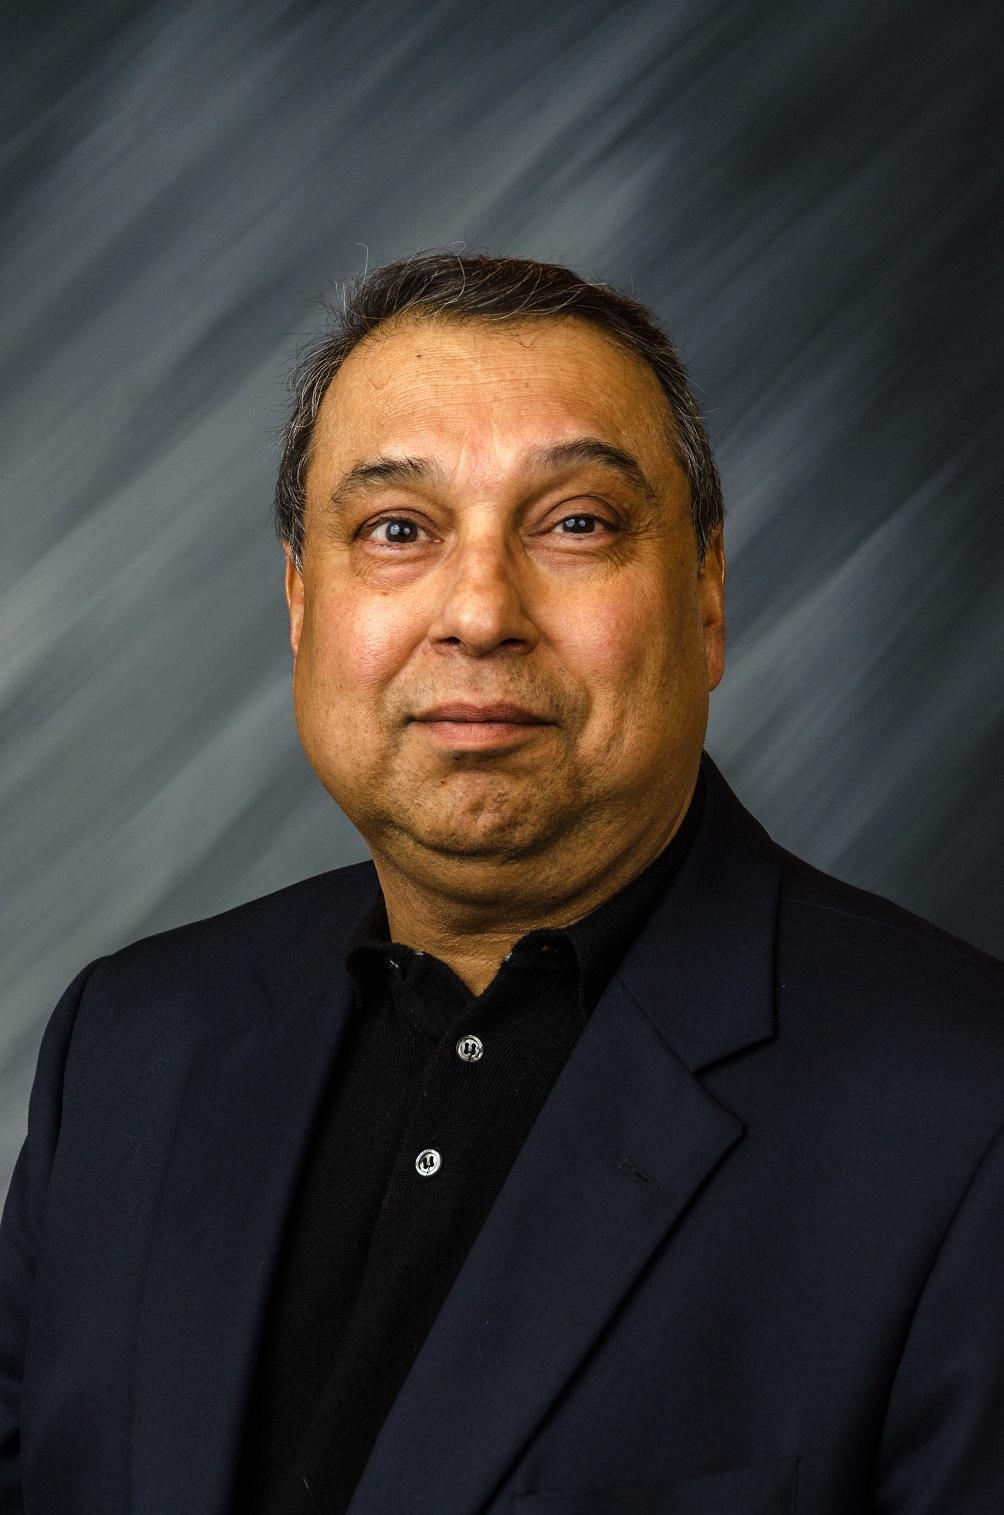 Neurologist in NY Garden City 11530 Ajay Misra, MD 1401 Franklin Ave Fl 2 (516)747-0000